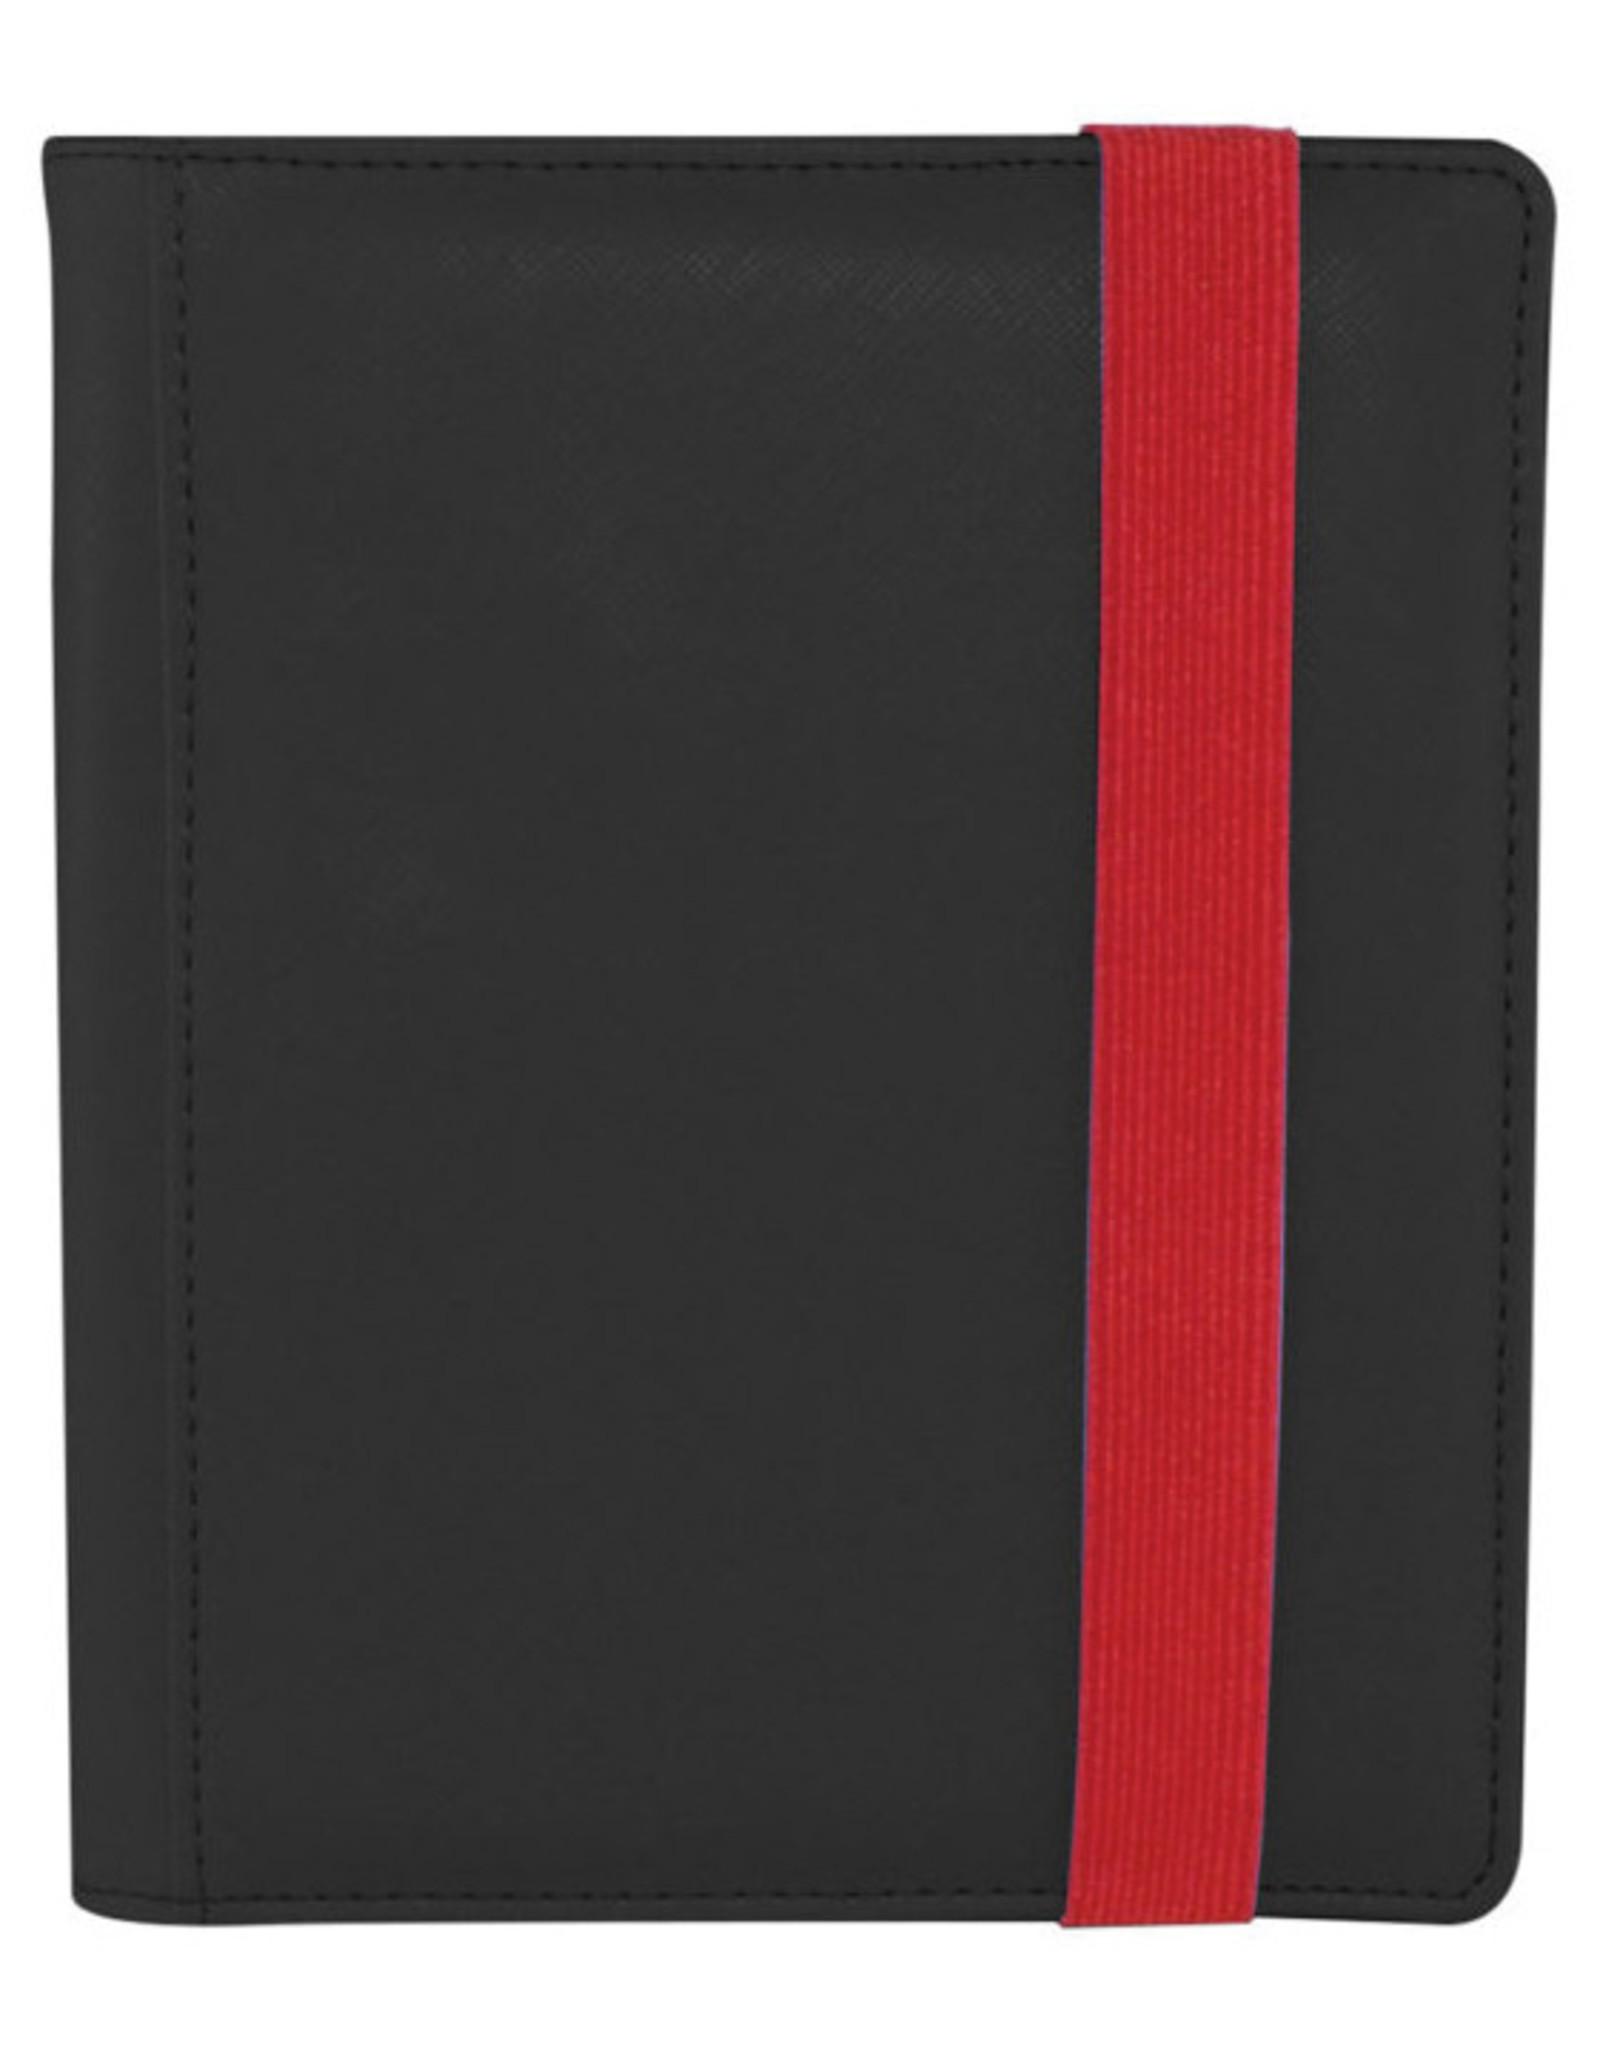 Dex Protection Dex 4-Pocket Binder Black